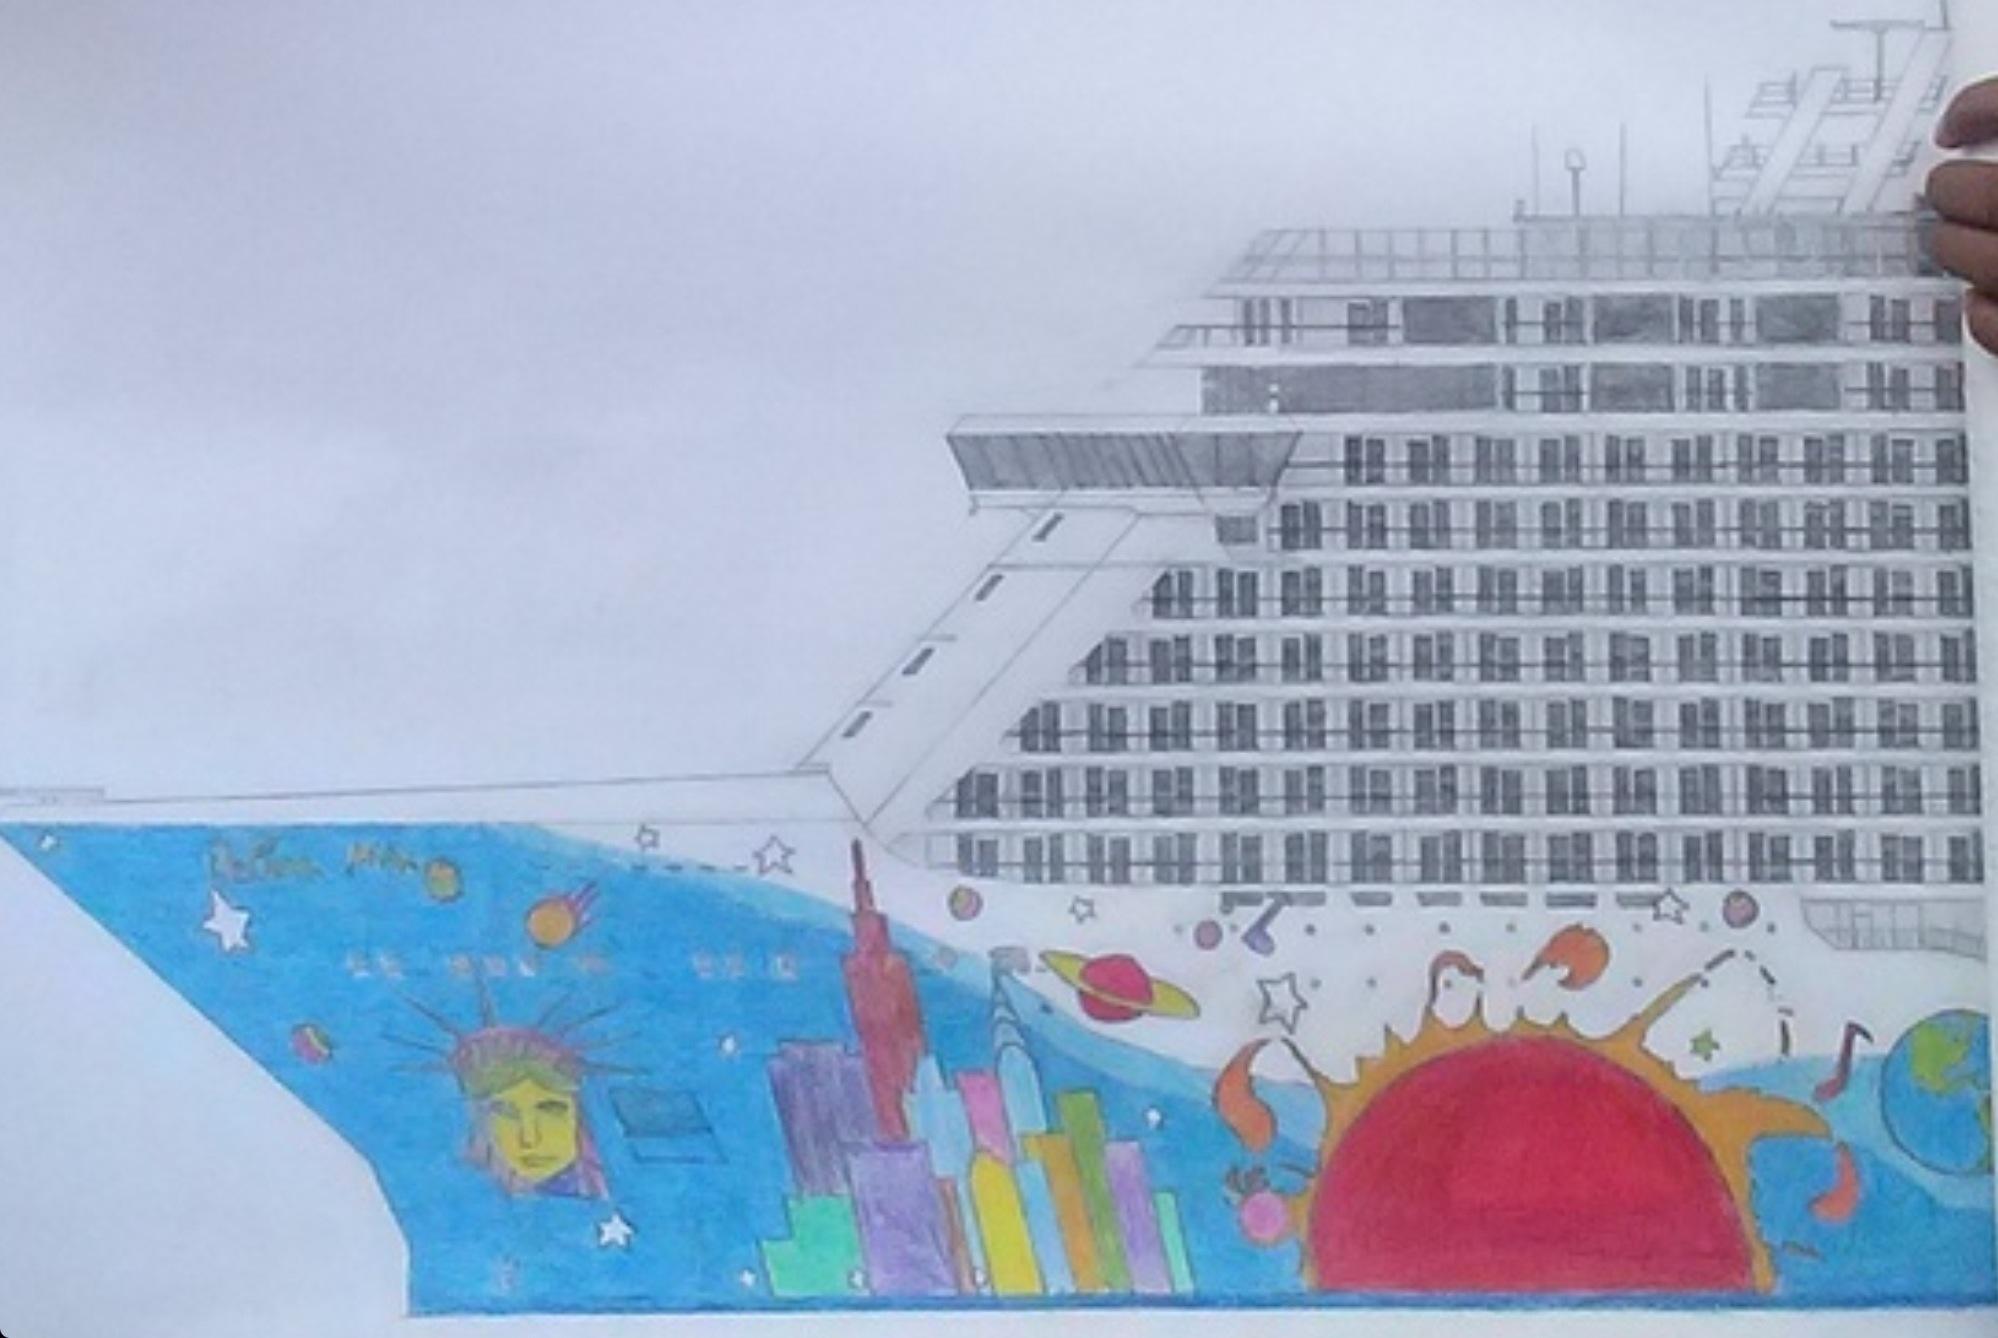 Detail from Saul's drawing of Norwegian Breakaway (Picture: Saul Tenorio Rodriguez)